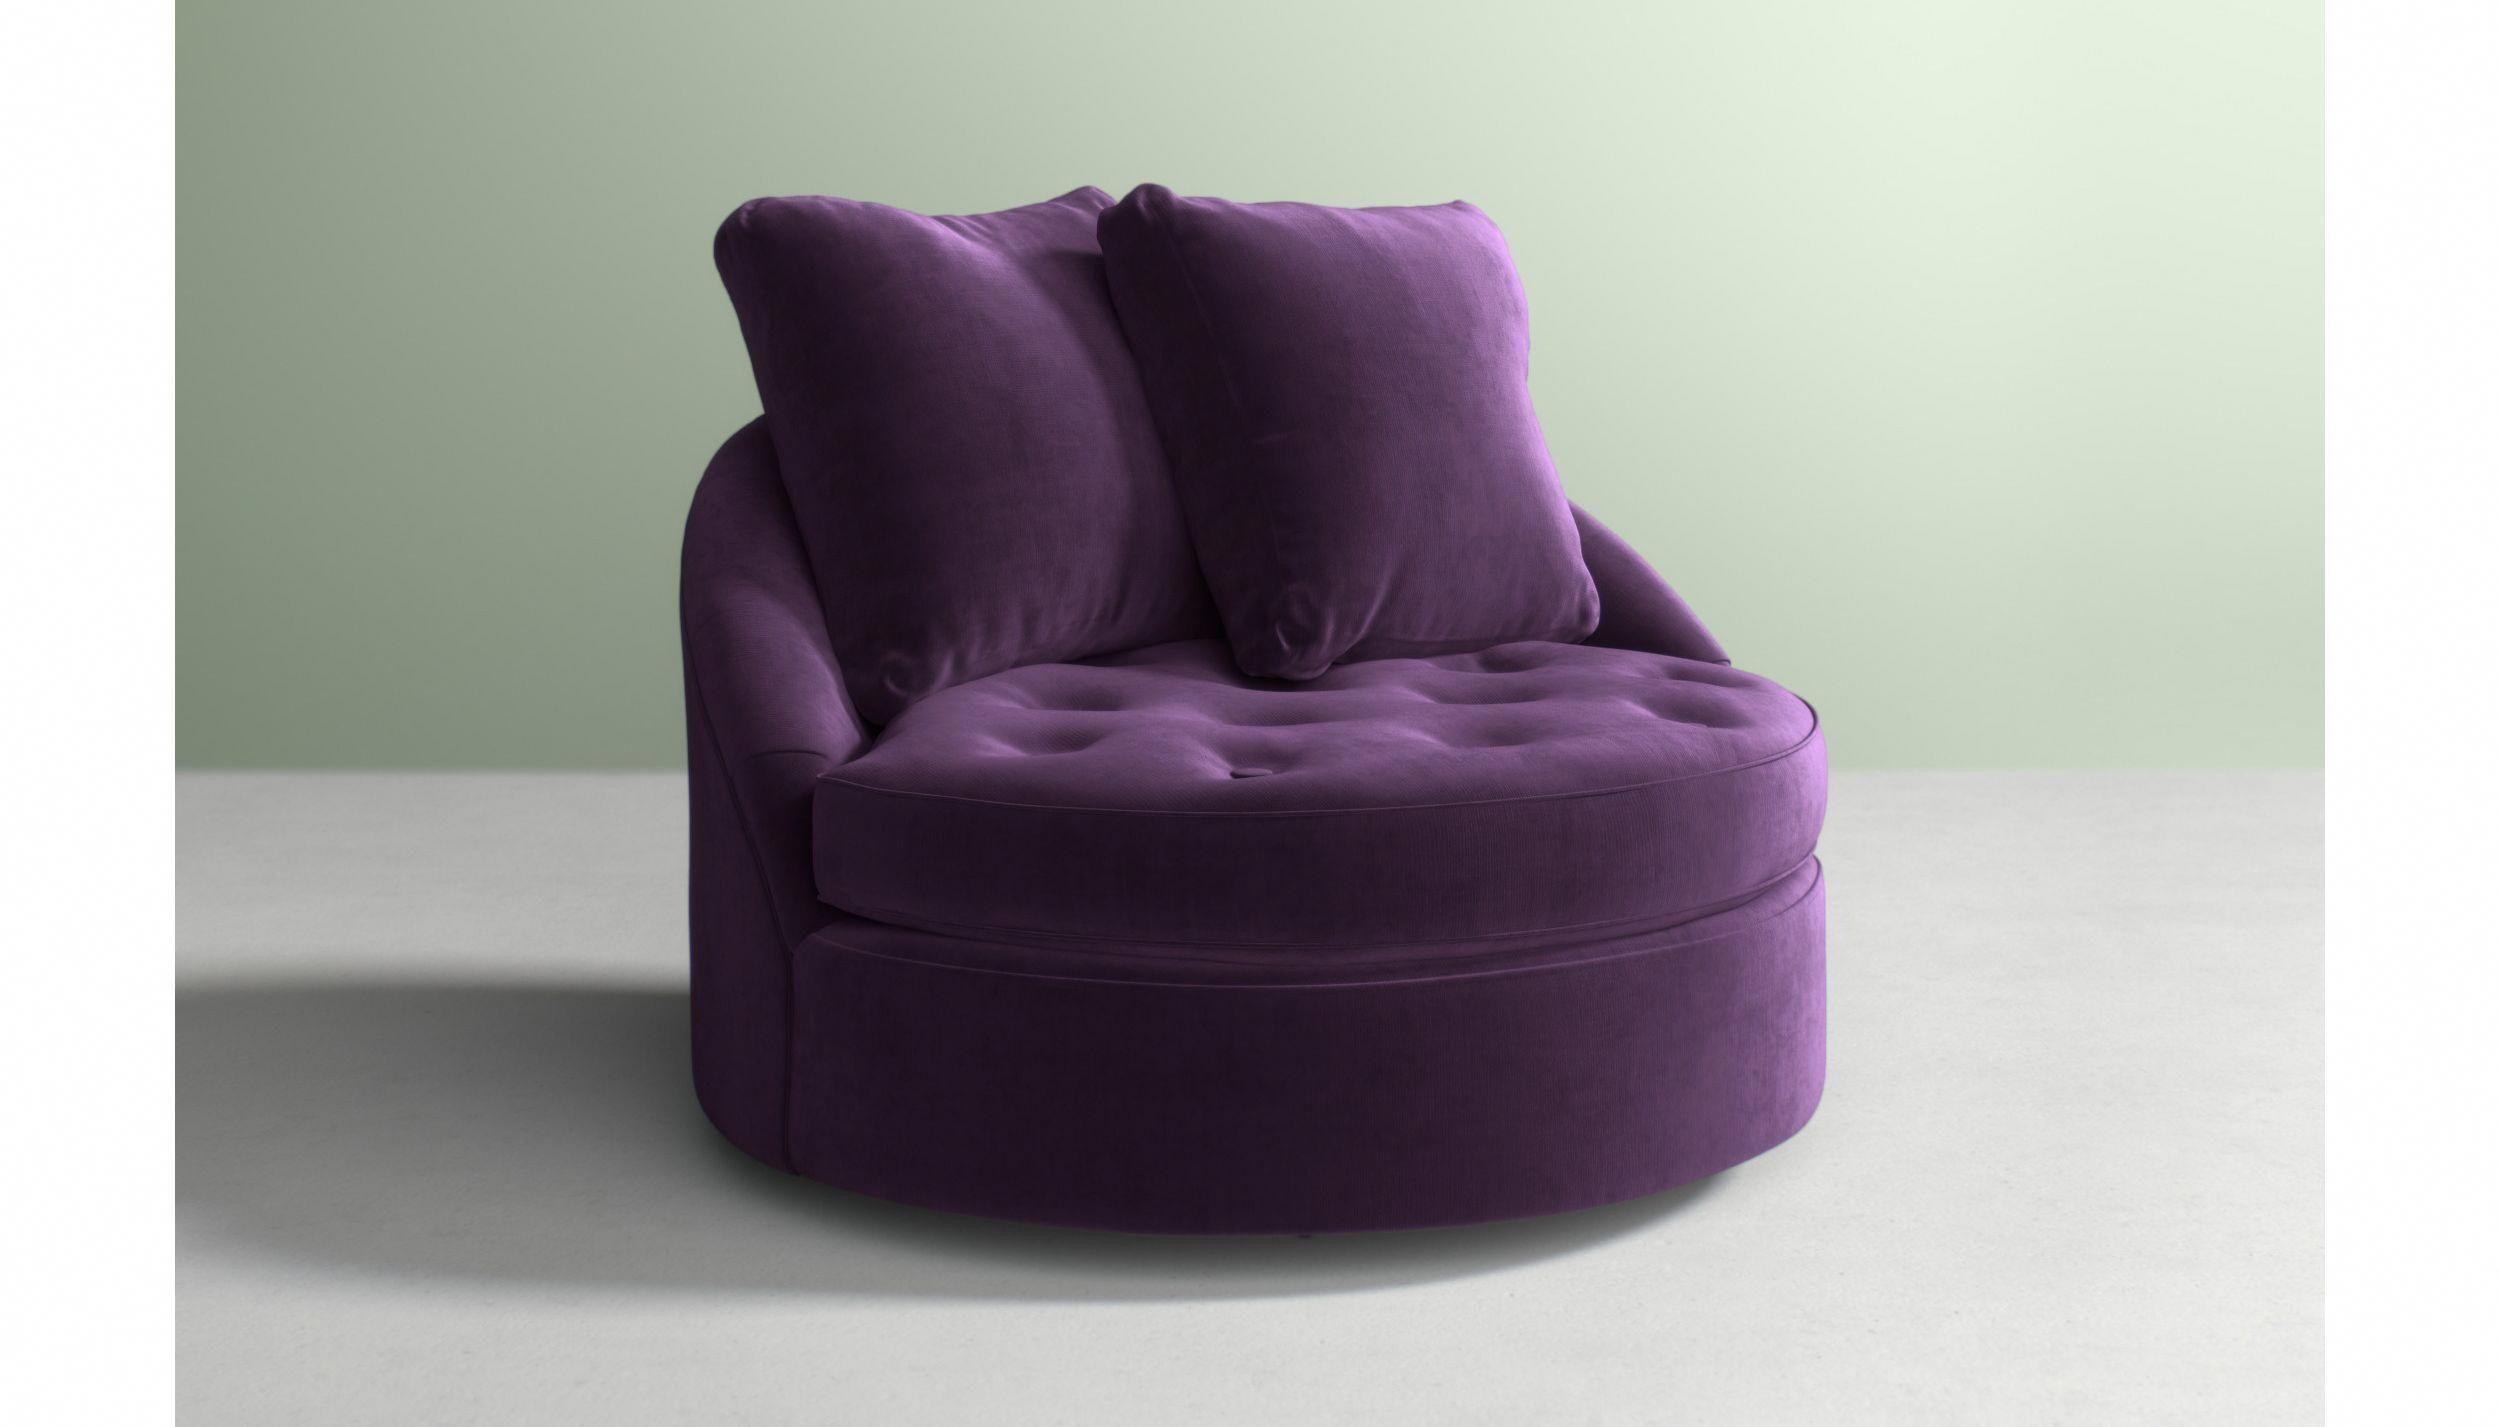 Barwick swivel chair shabbychicchair chair bed dining